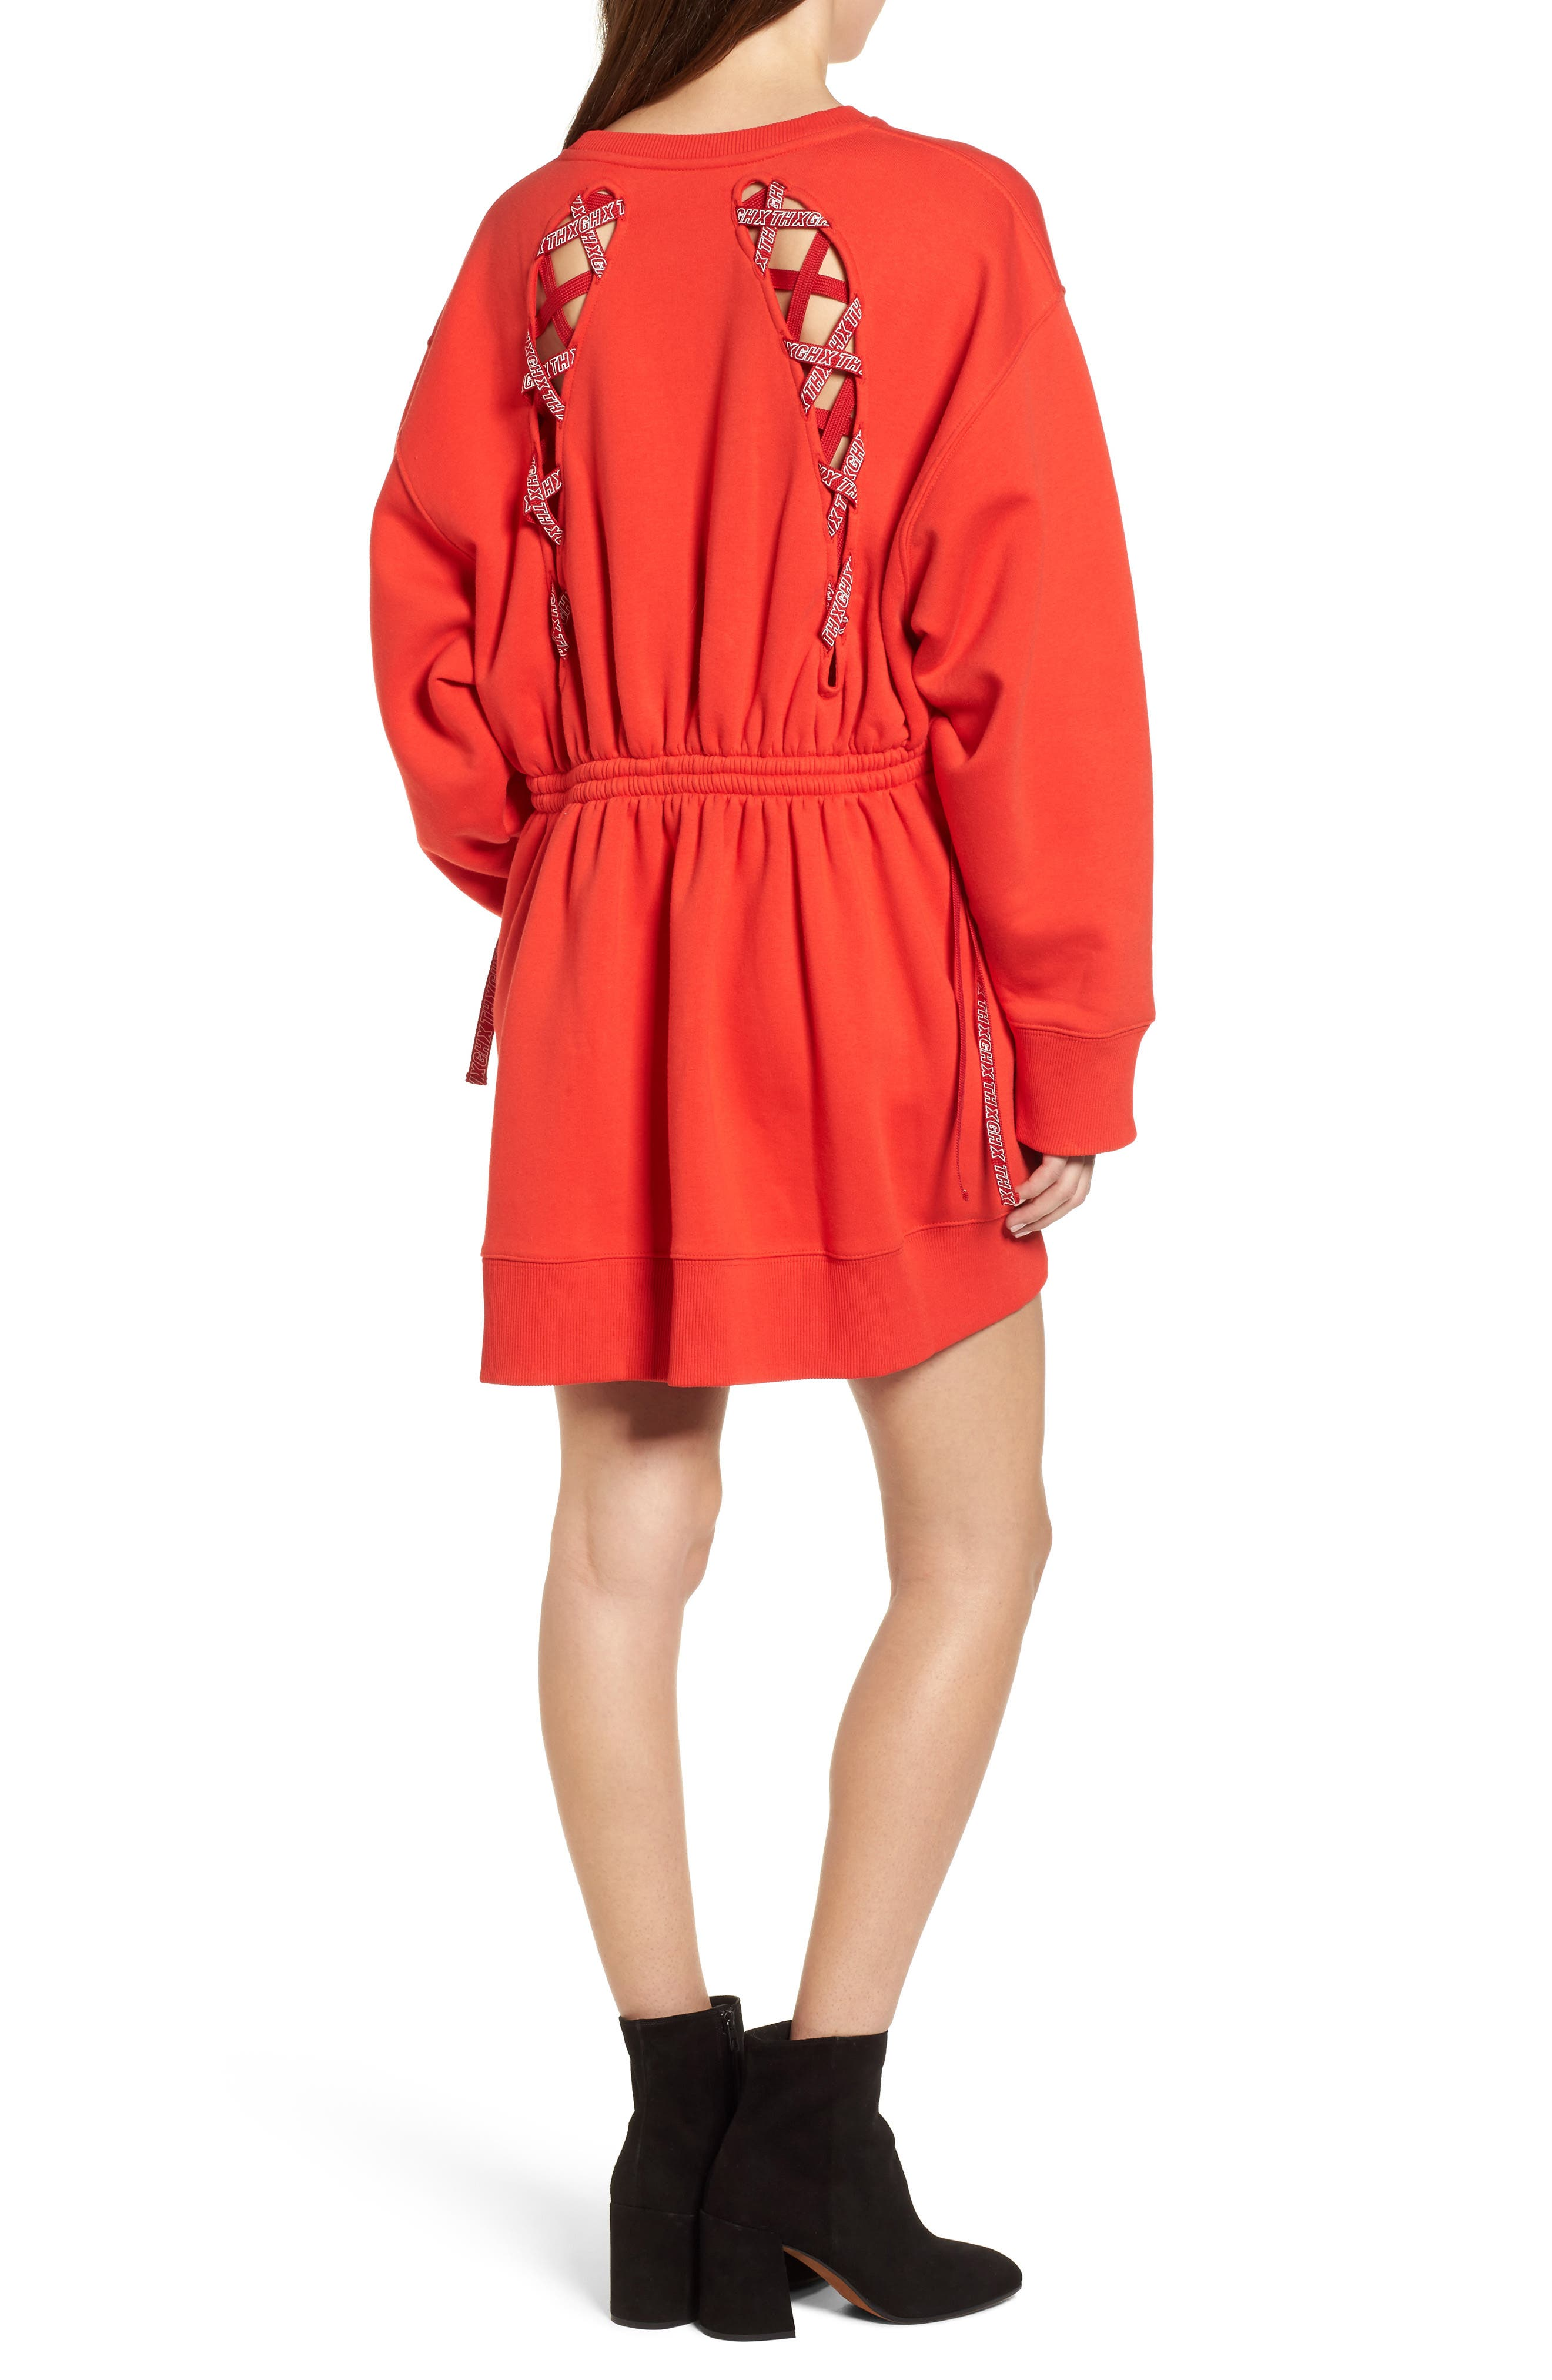 x Gigi Hadid Sweatshirt Dress,                             Alternate thumbnail 2, color,                             Flame Scarlet